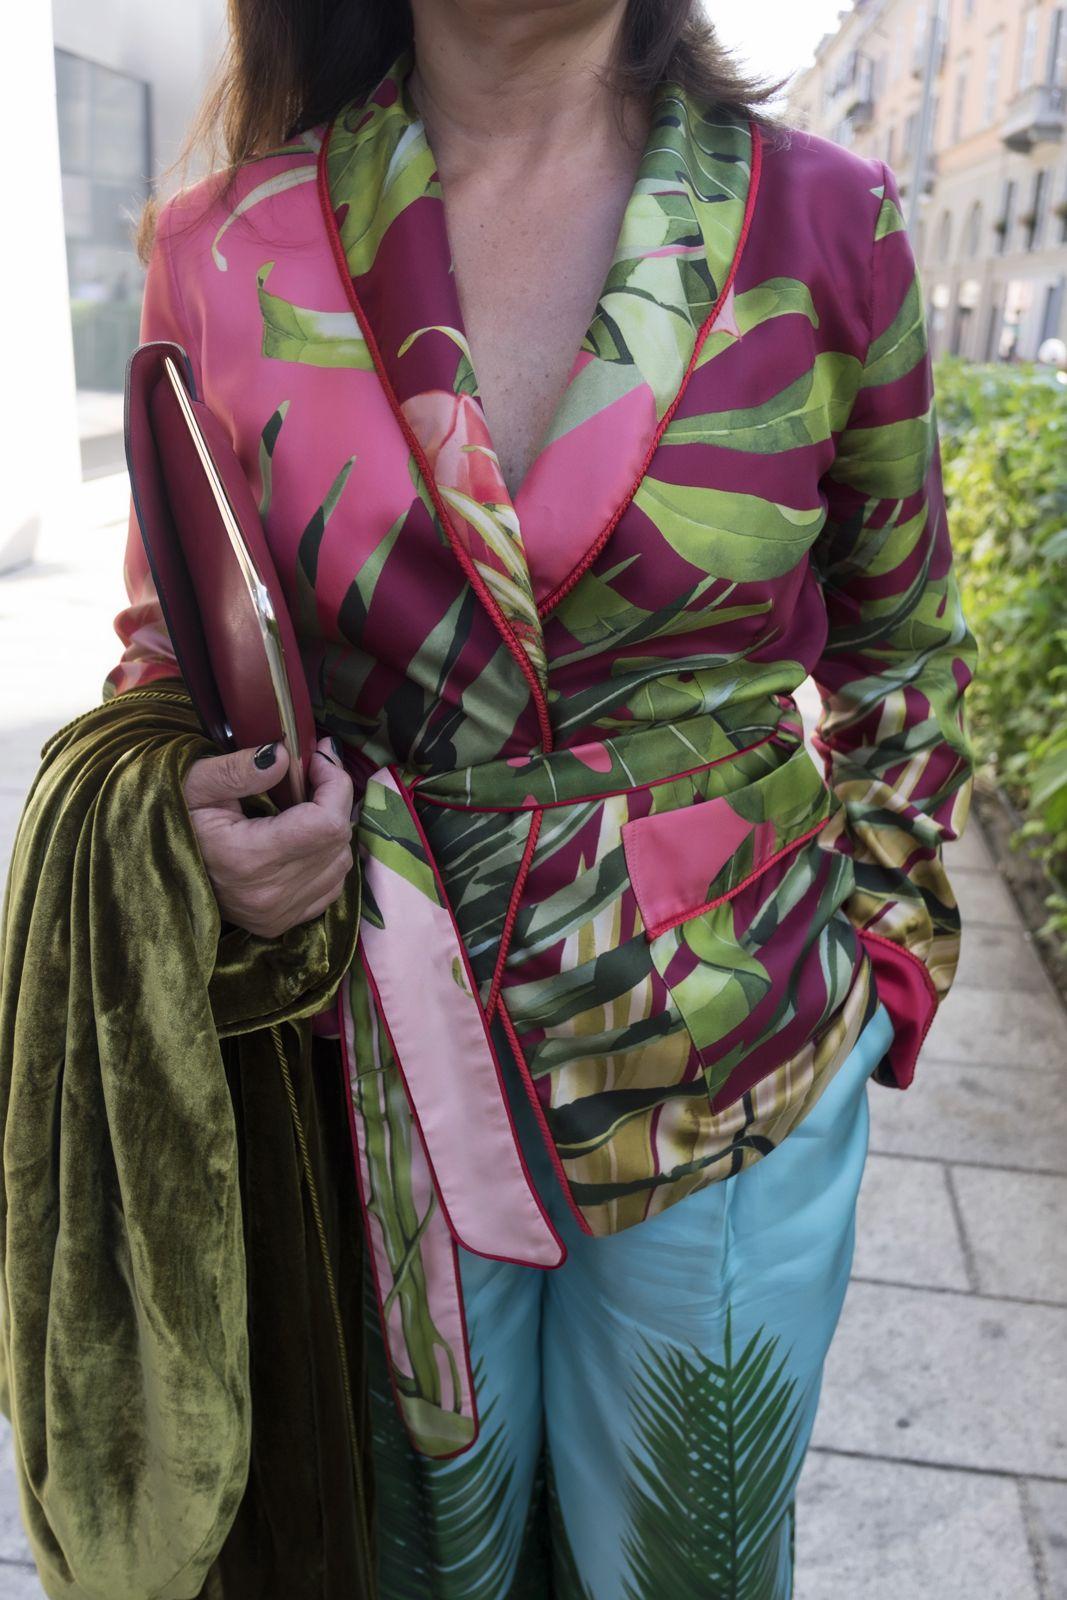 Fashion for woman over fifty Rita Palazzi